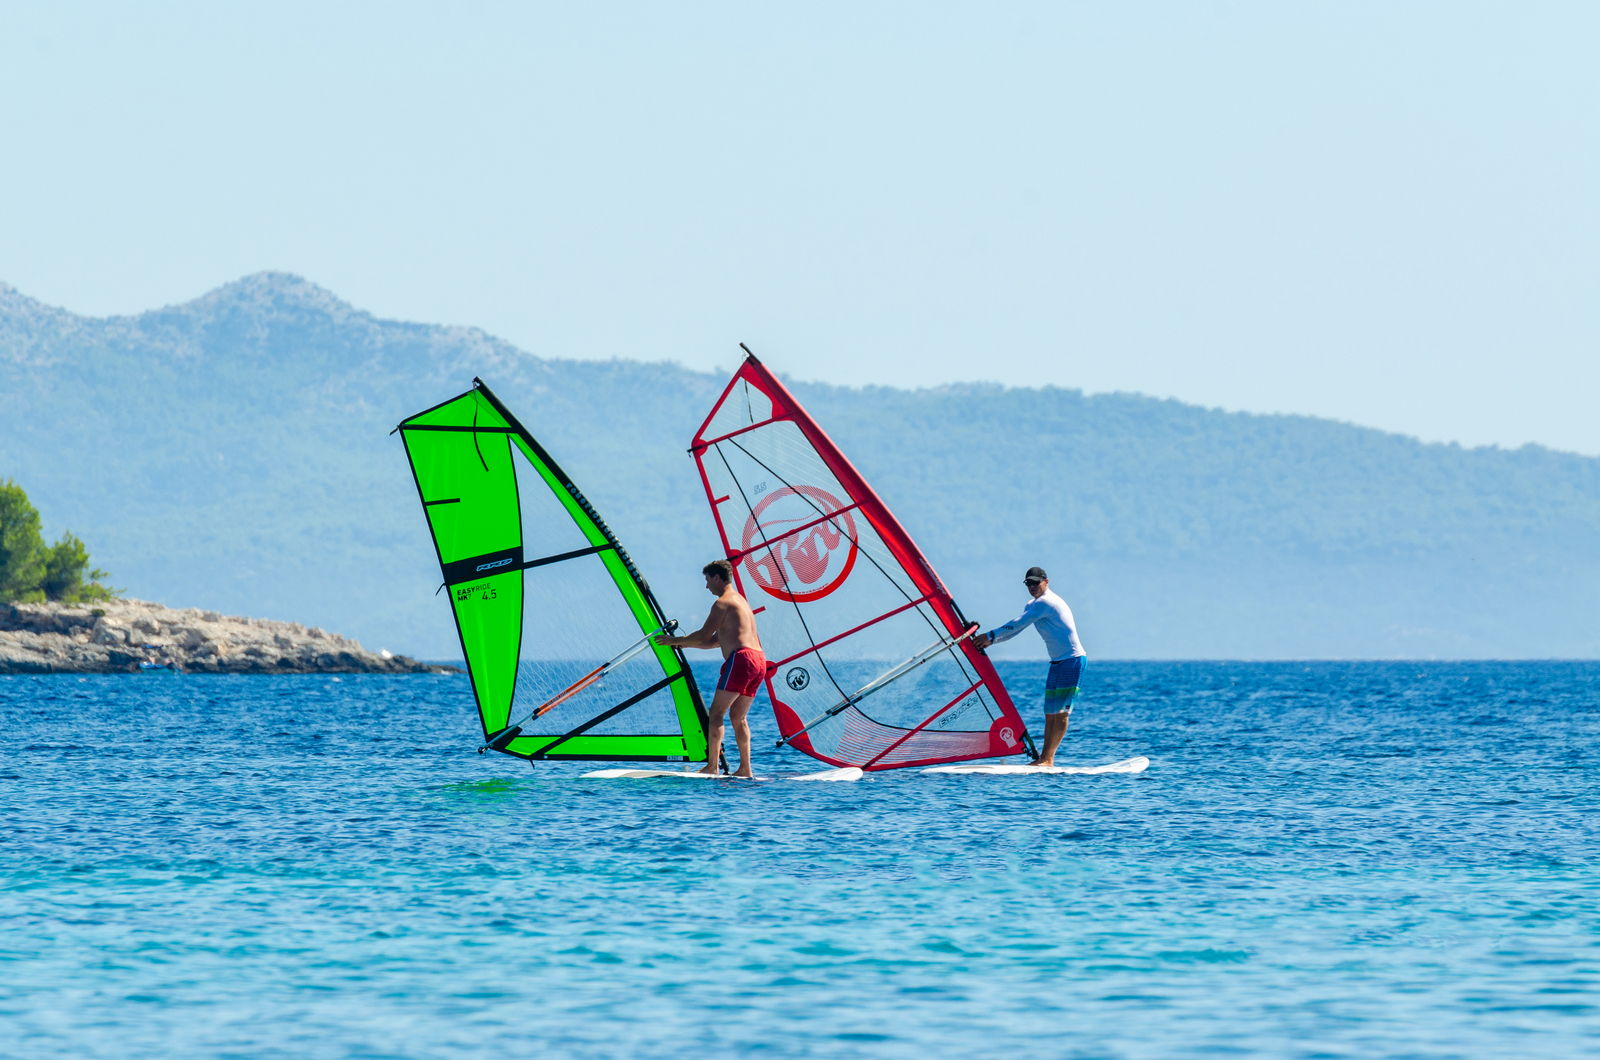 windsurfing korcula school extreme 11 - Location - Prizba, Korcula